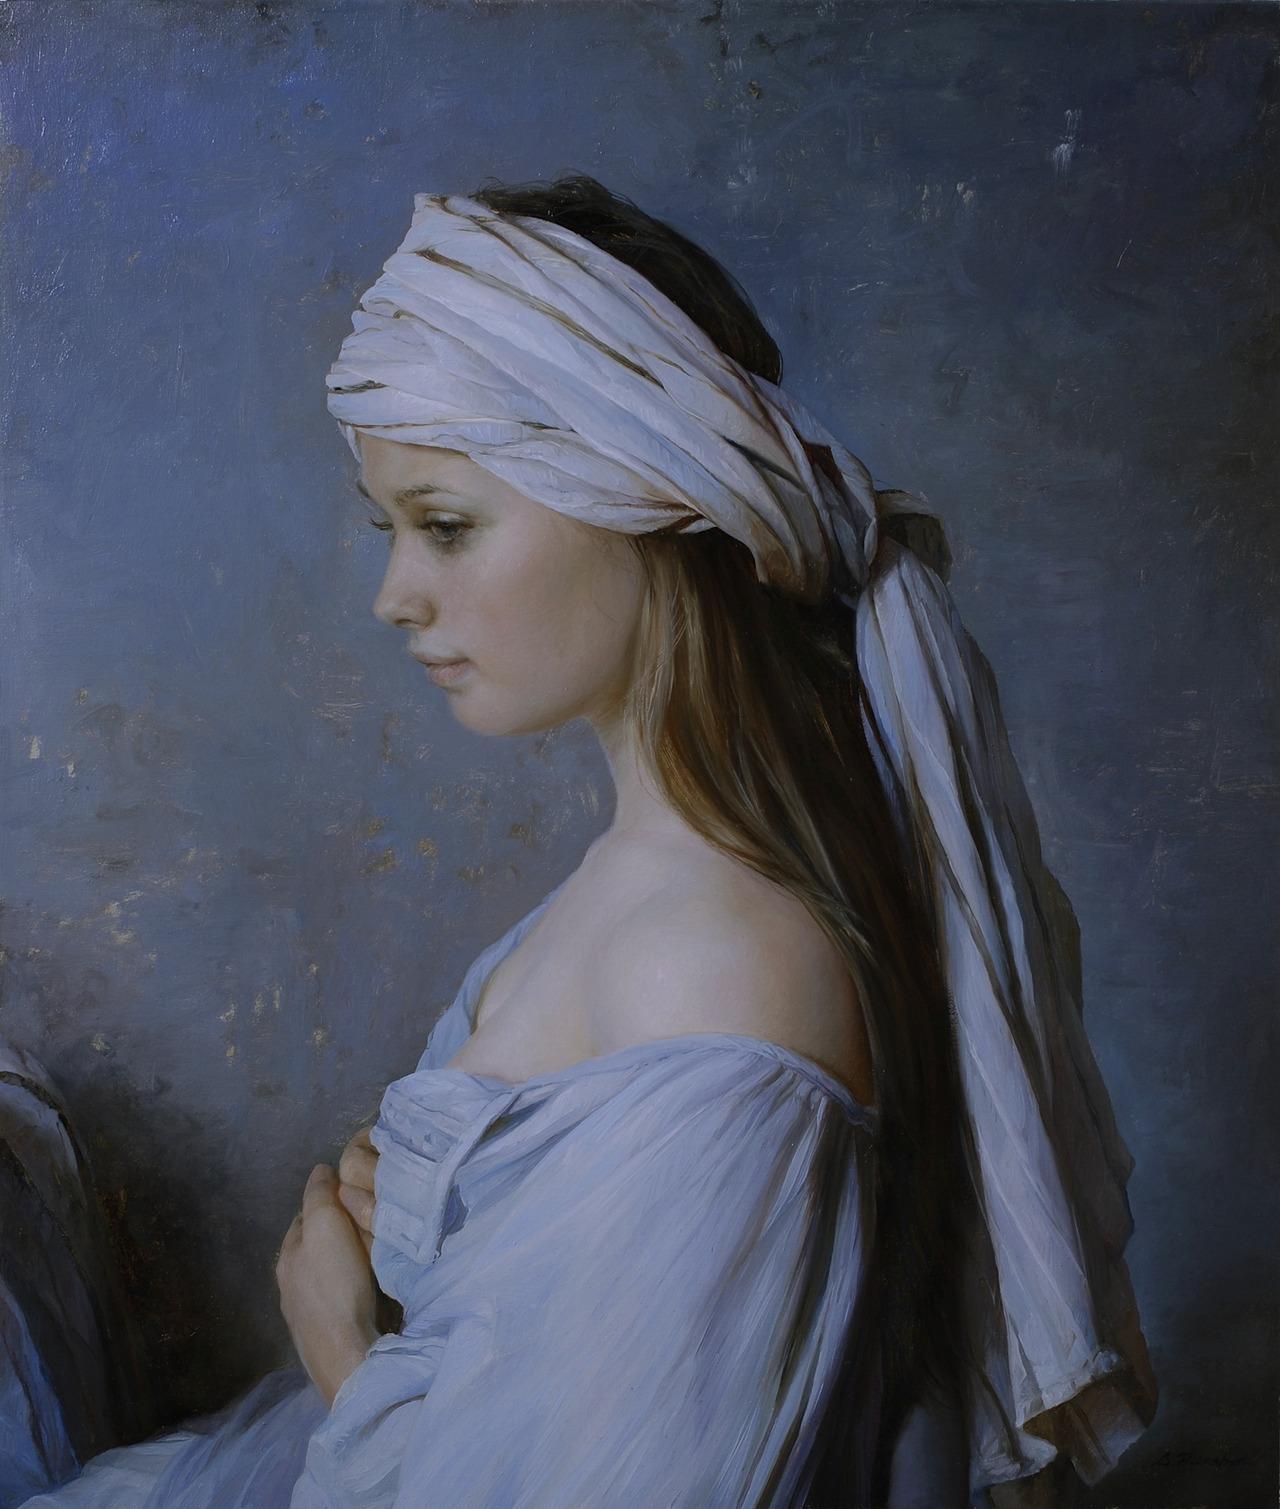 Women's images by a Russian realist artist Sergey Marshennikov - 26